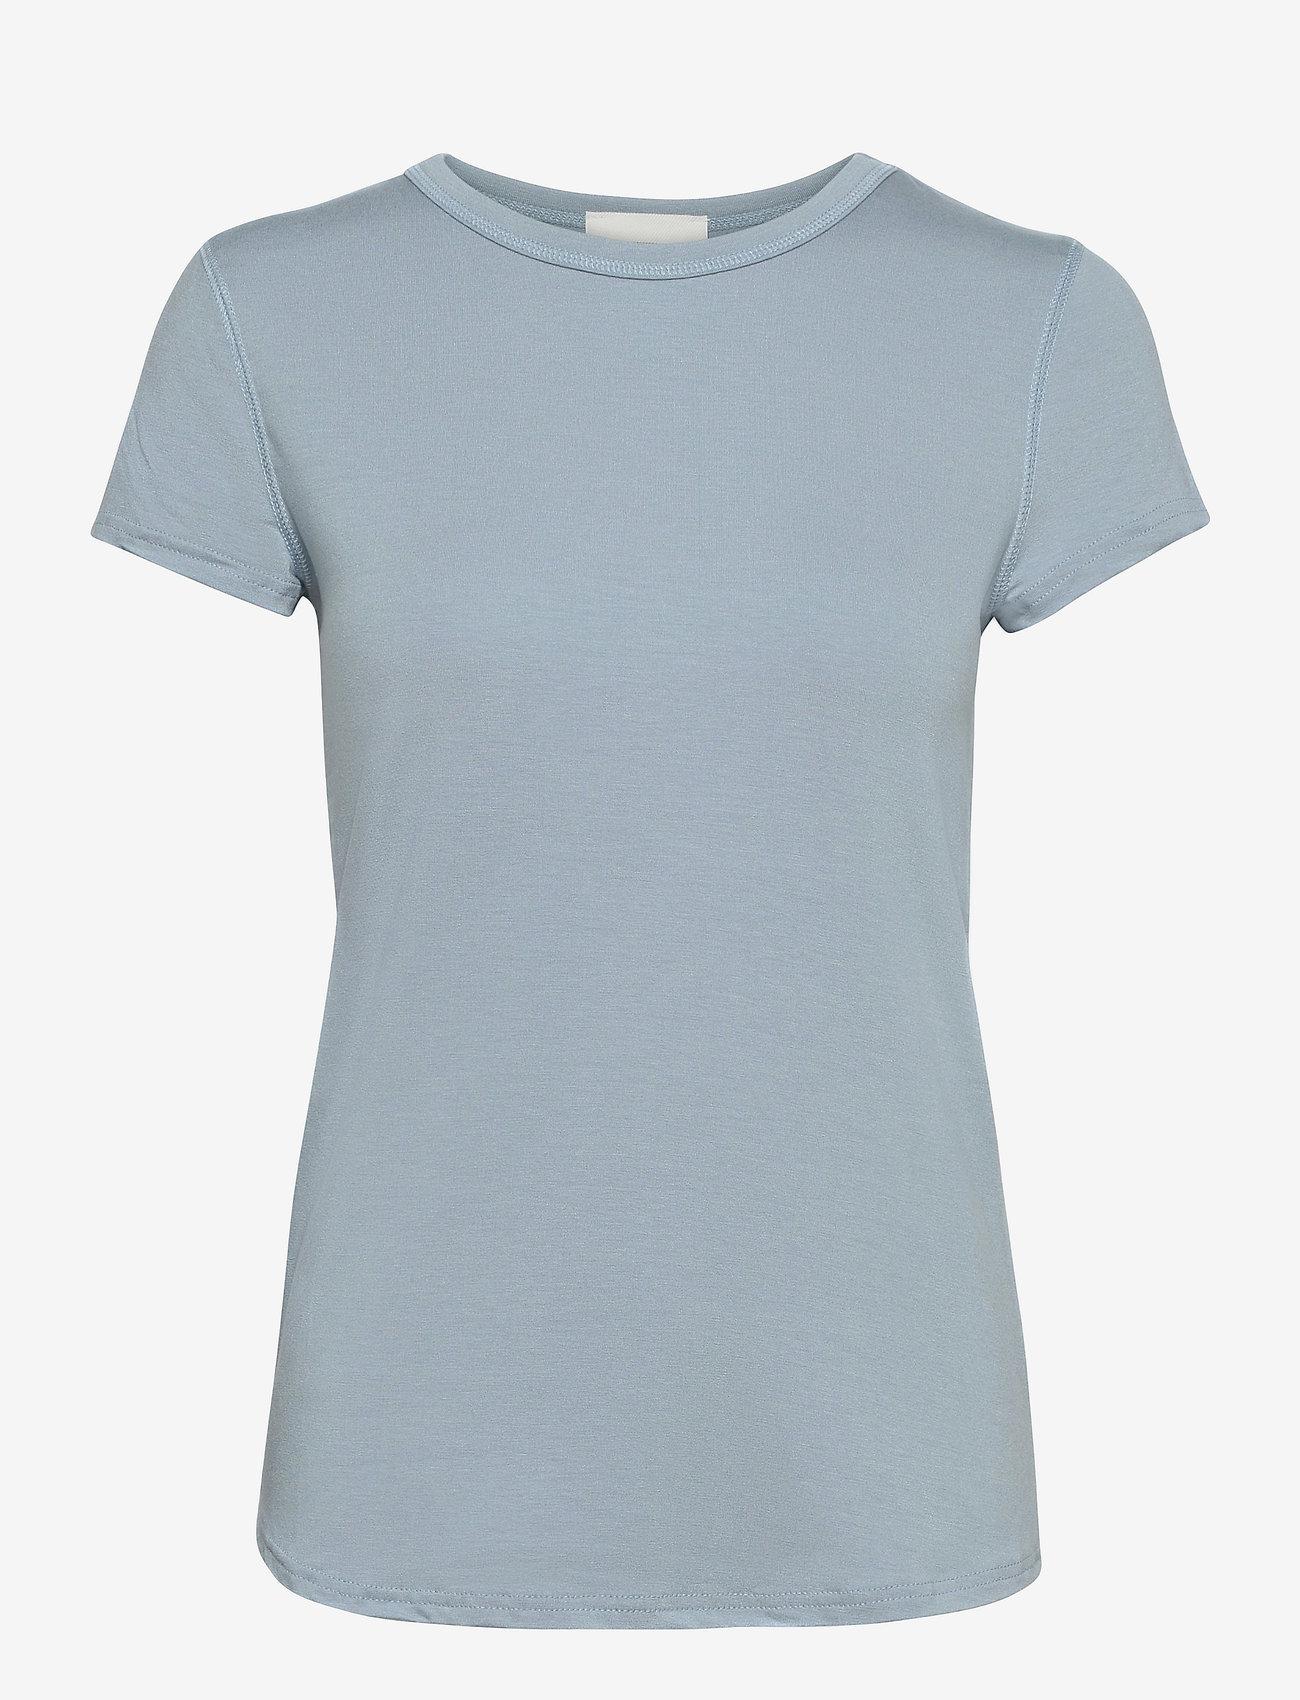 Denim Hunter - 16 THE MODAL TEE - t-shirts - ashley blue - 1